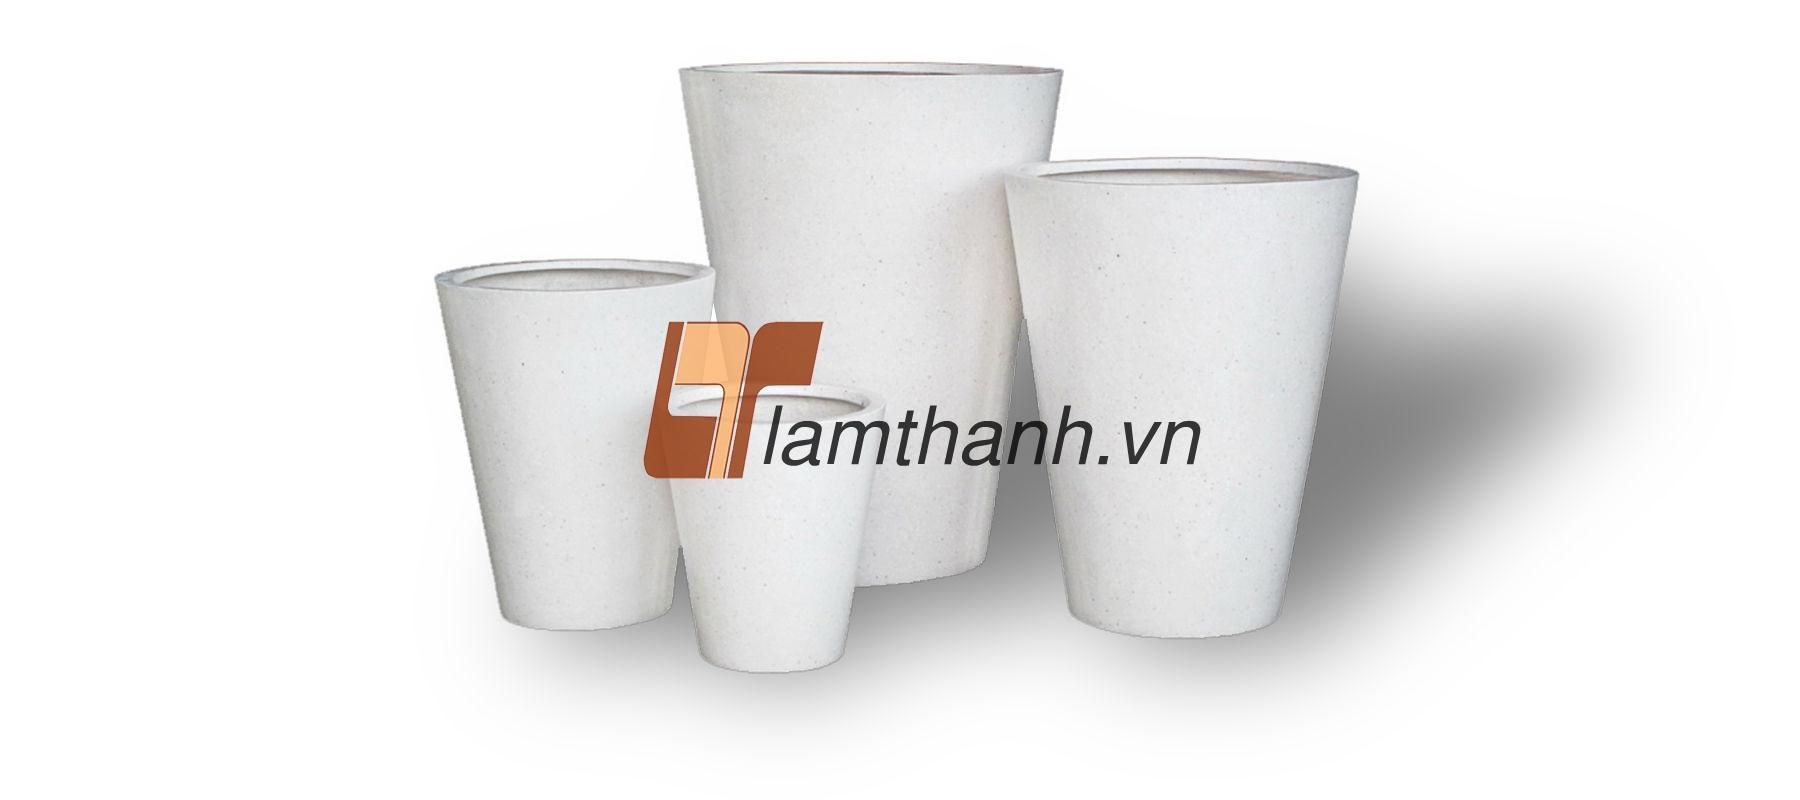 vietnam polyresin, fiberstone 02